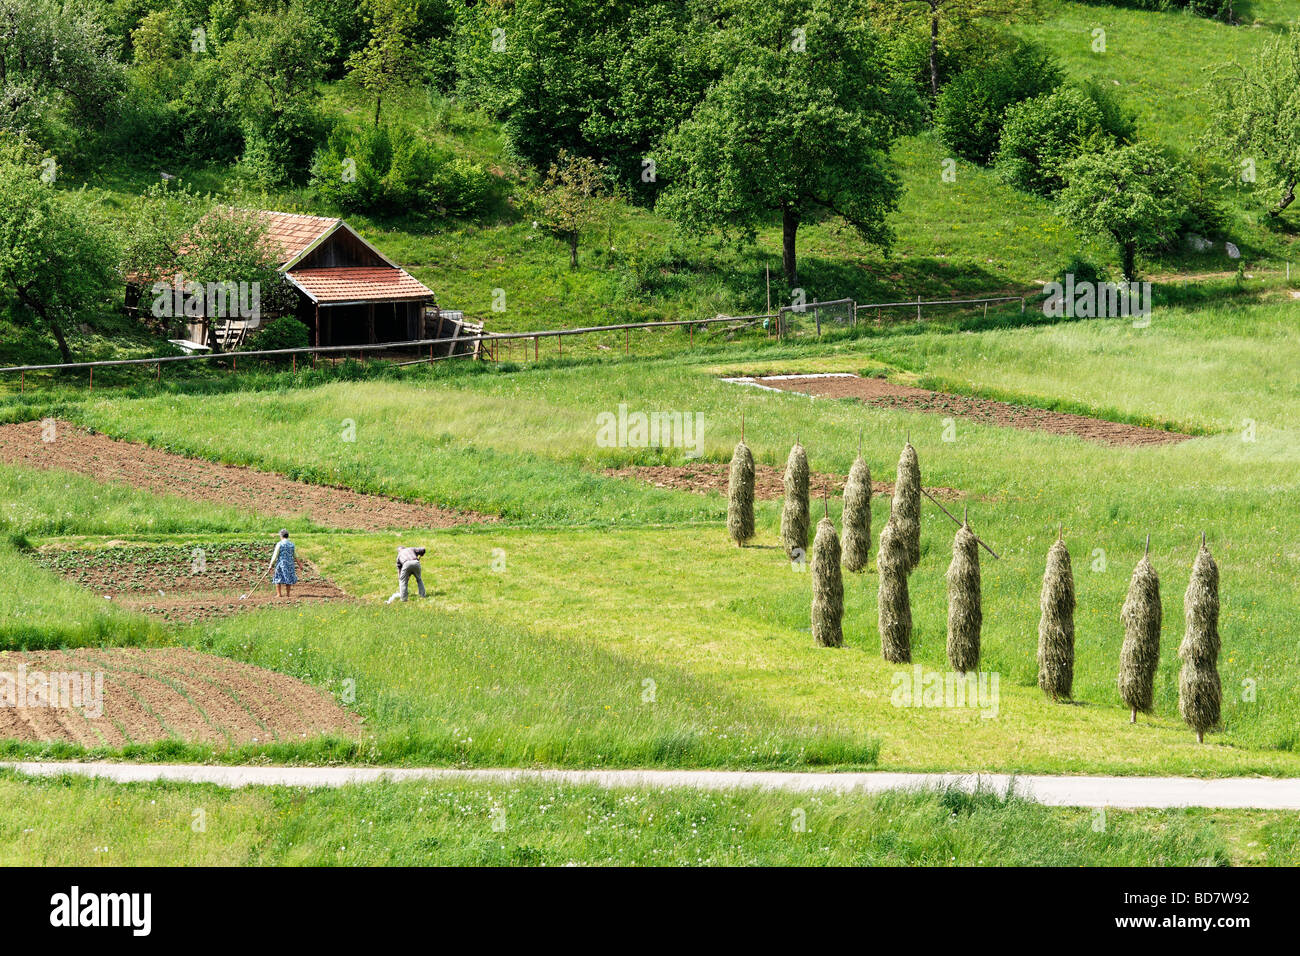 An elderly couple tending their plot and hay drying on poles near Cerknica, Notranjska, Slovenia. - Stock Image